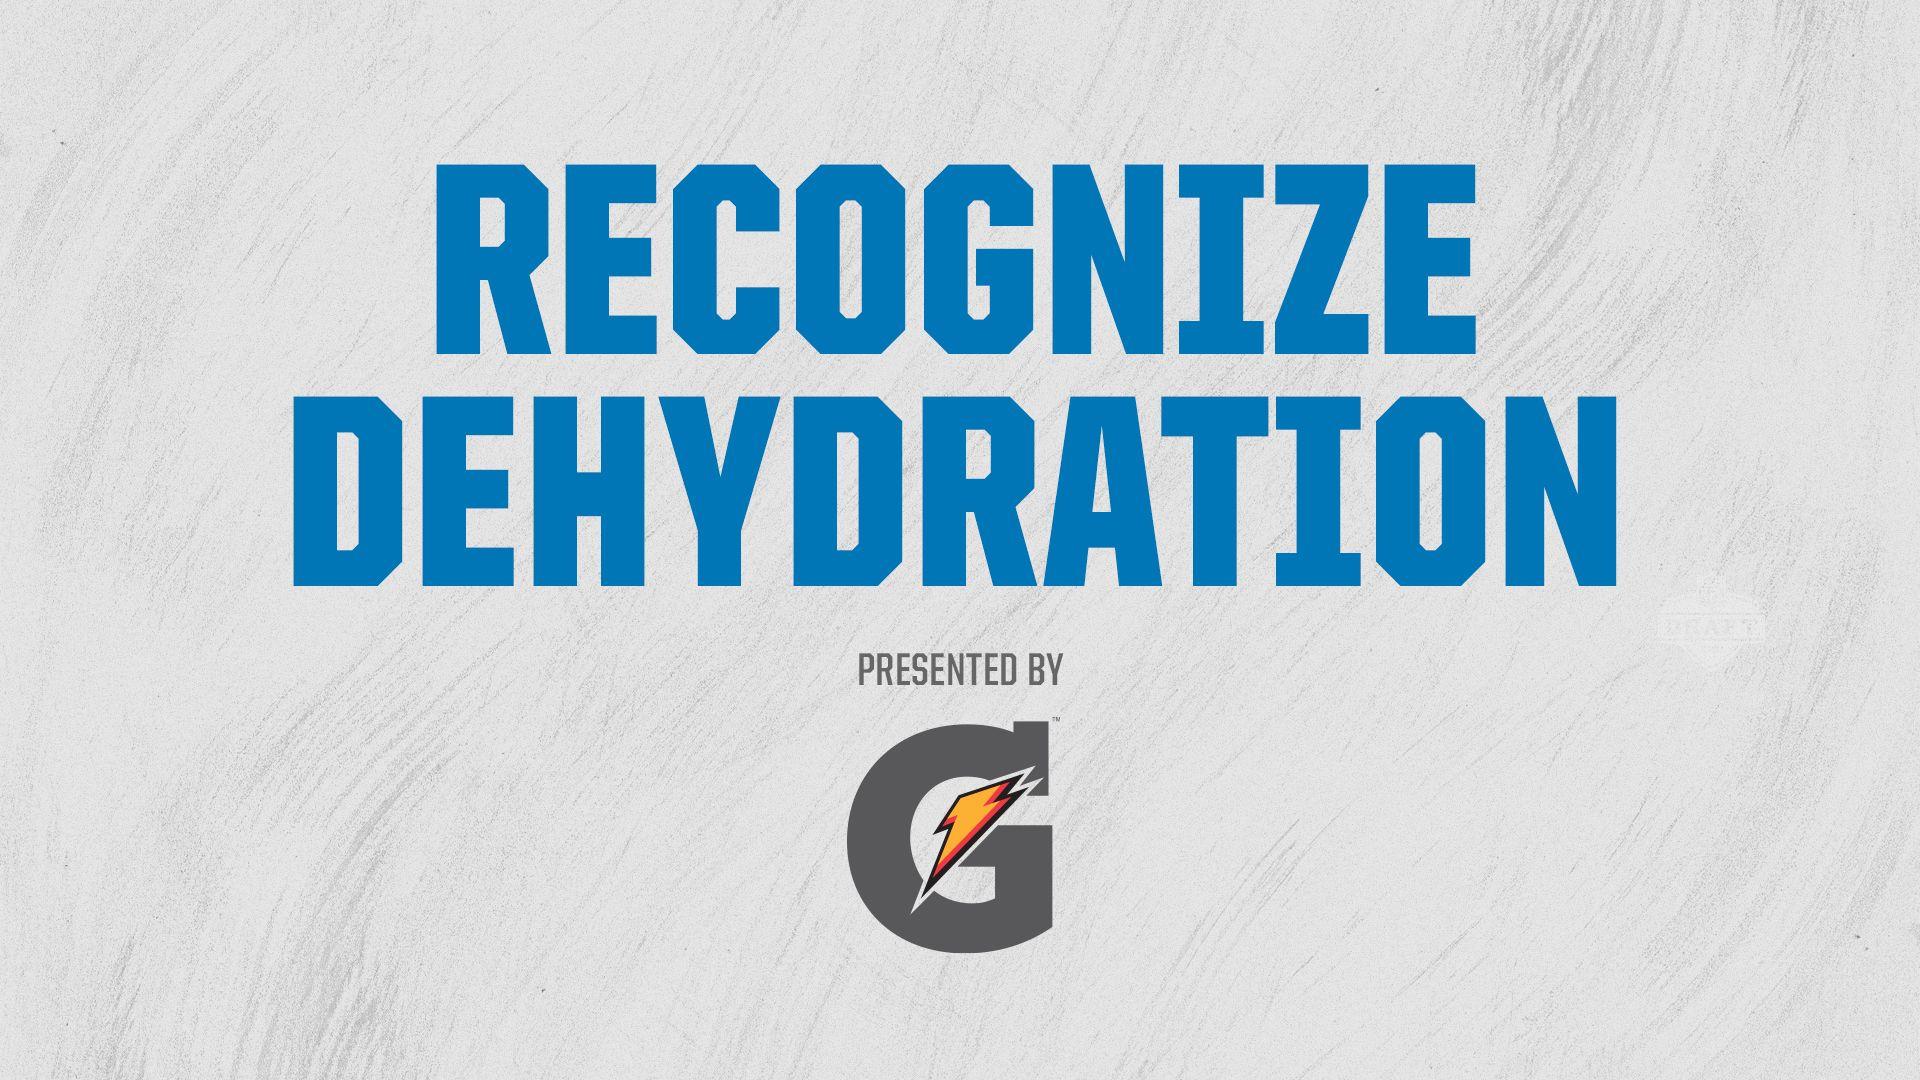 recognize-dehydration